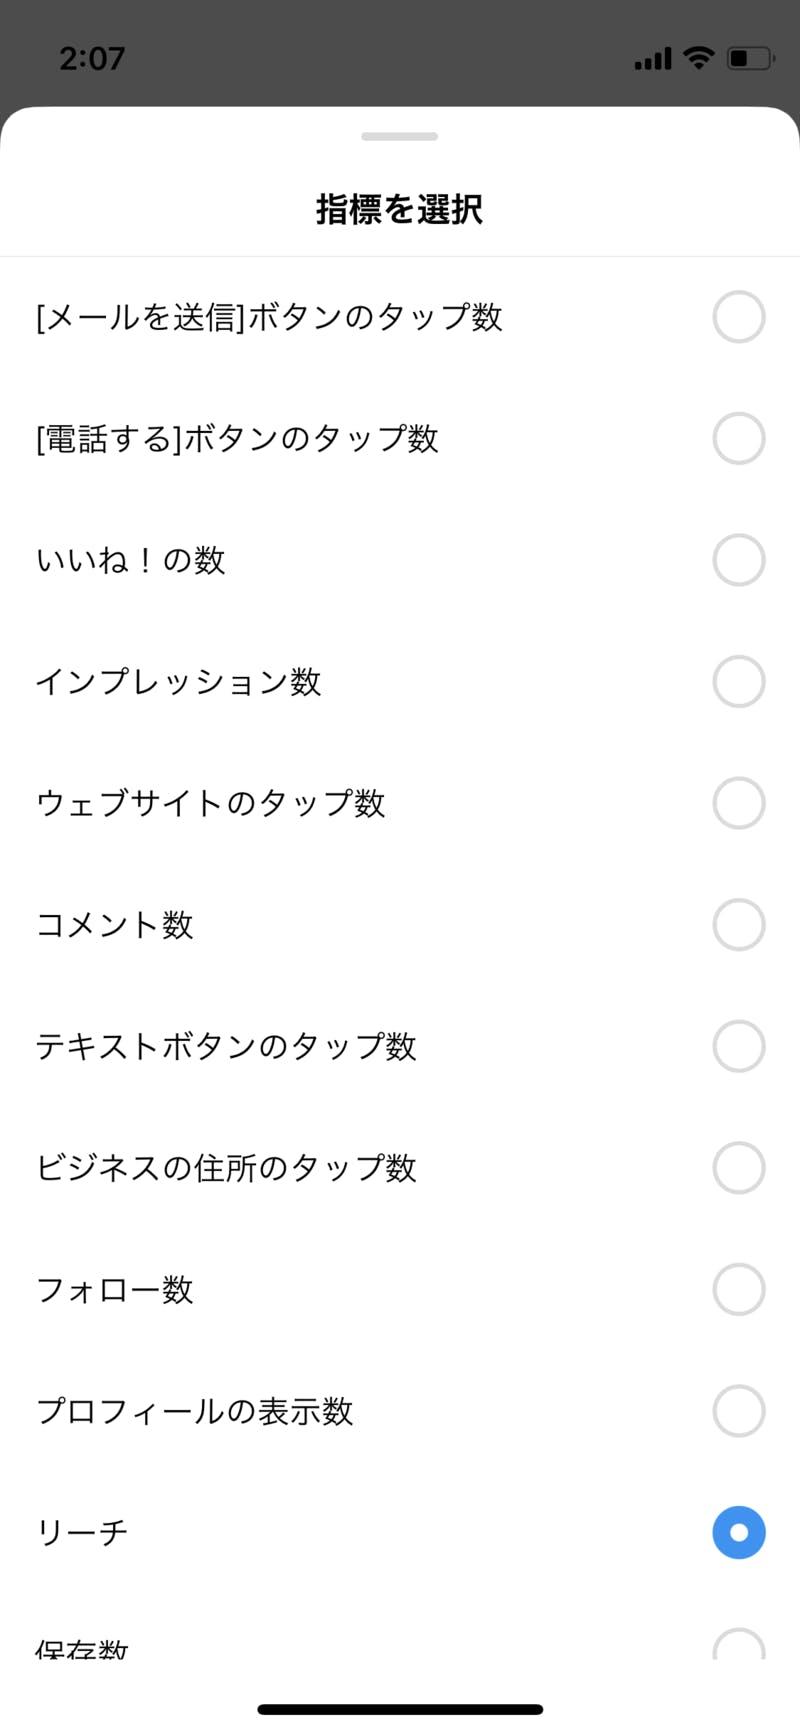 Instagramのインサイト、コンテンツの分析で選べる指標